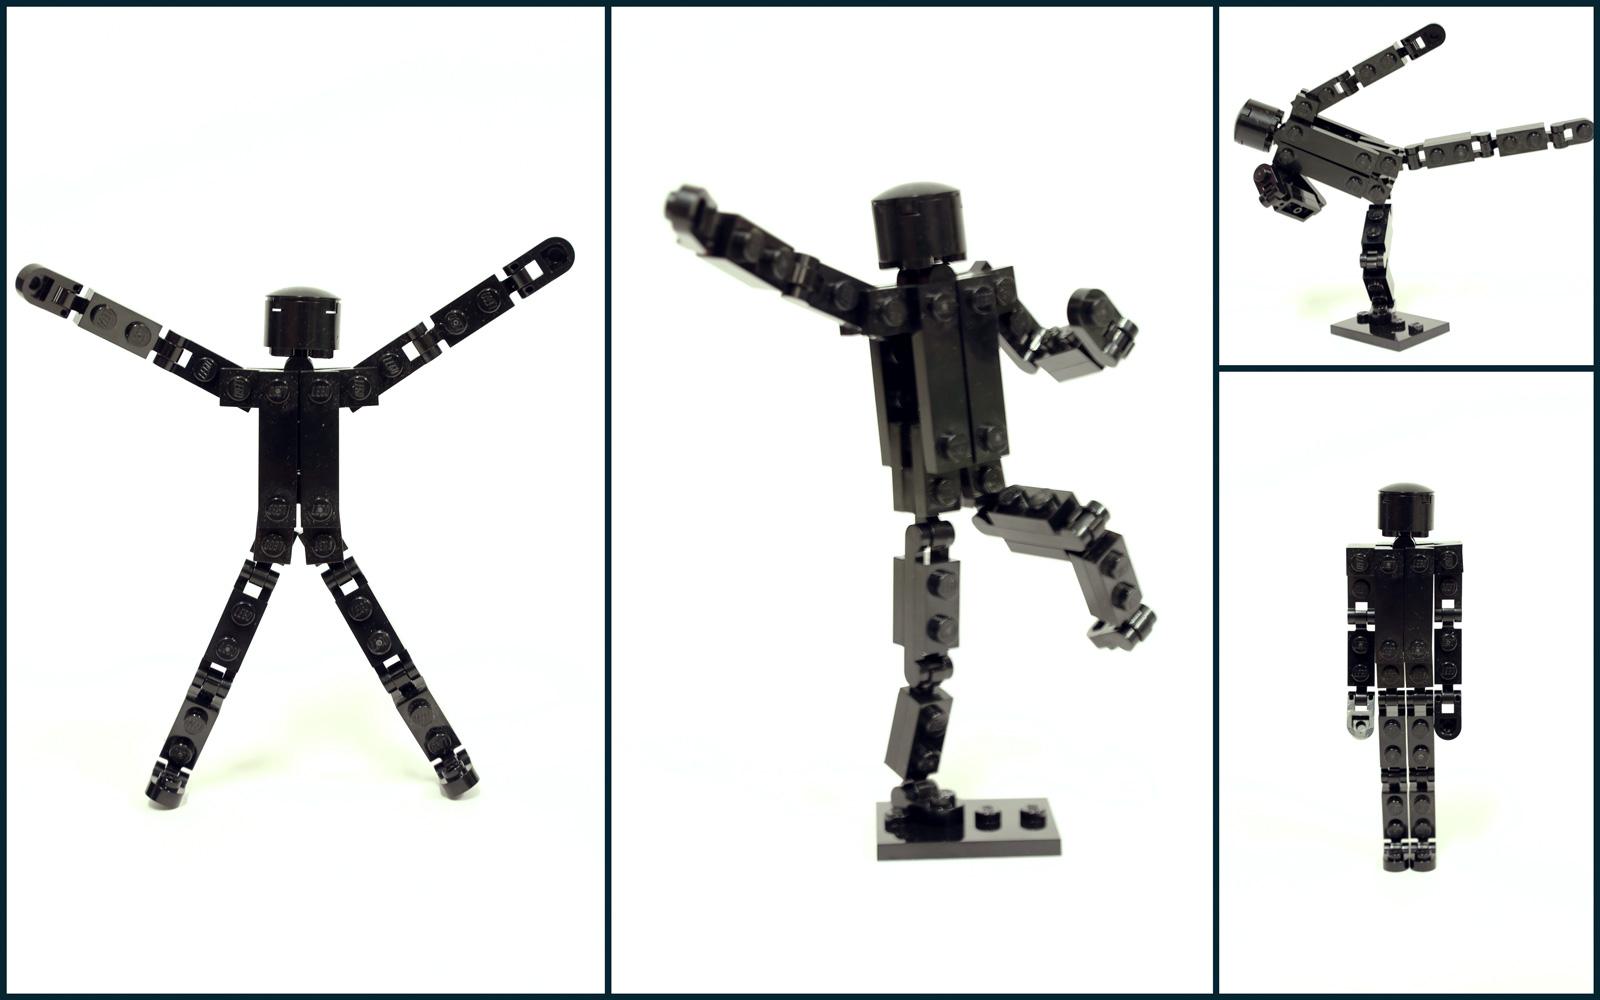 The New Black Tom Poulsom New Elementary A Lego 174 Blog